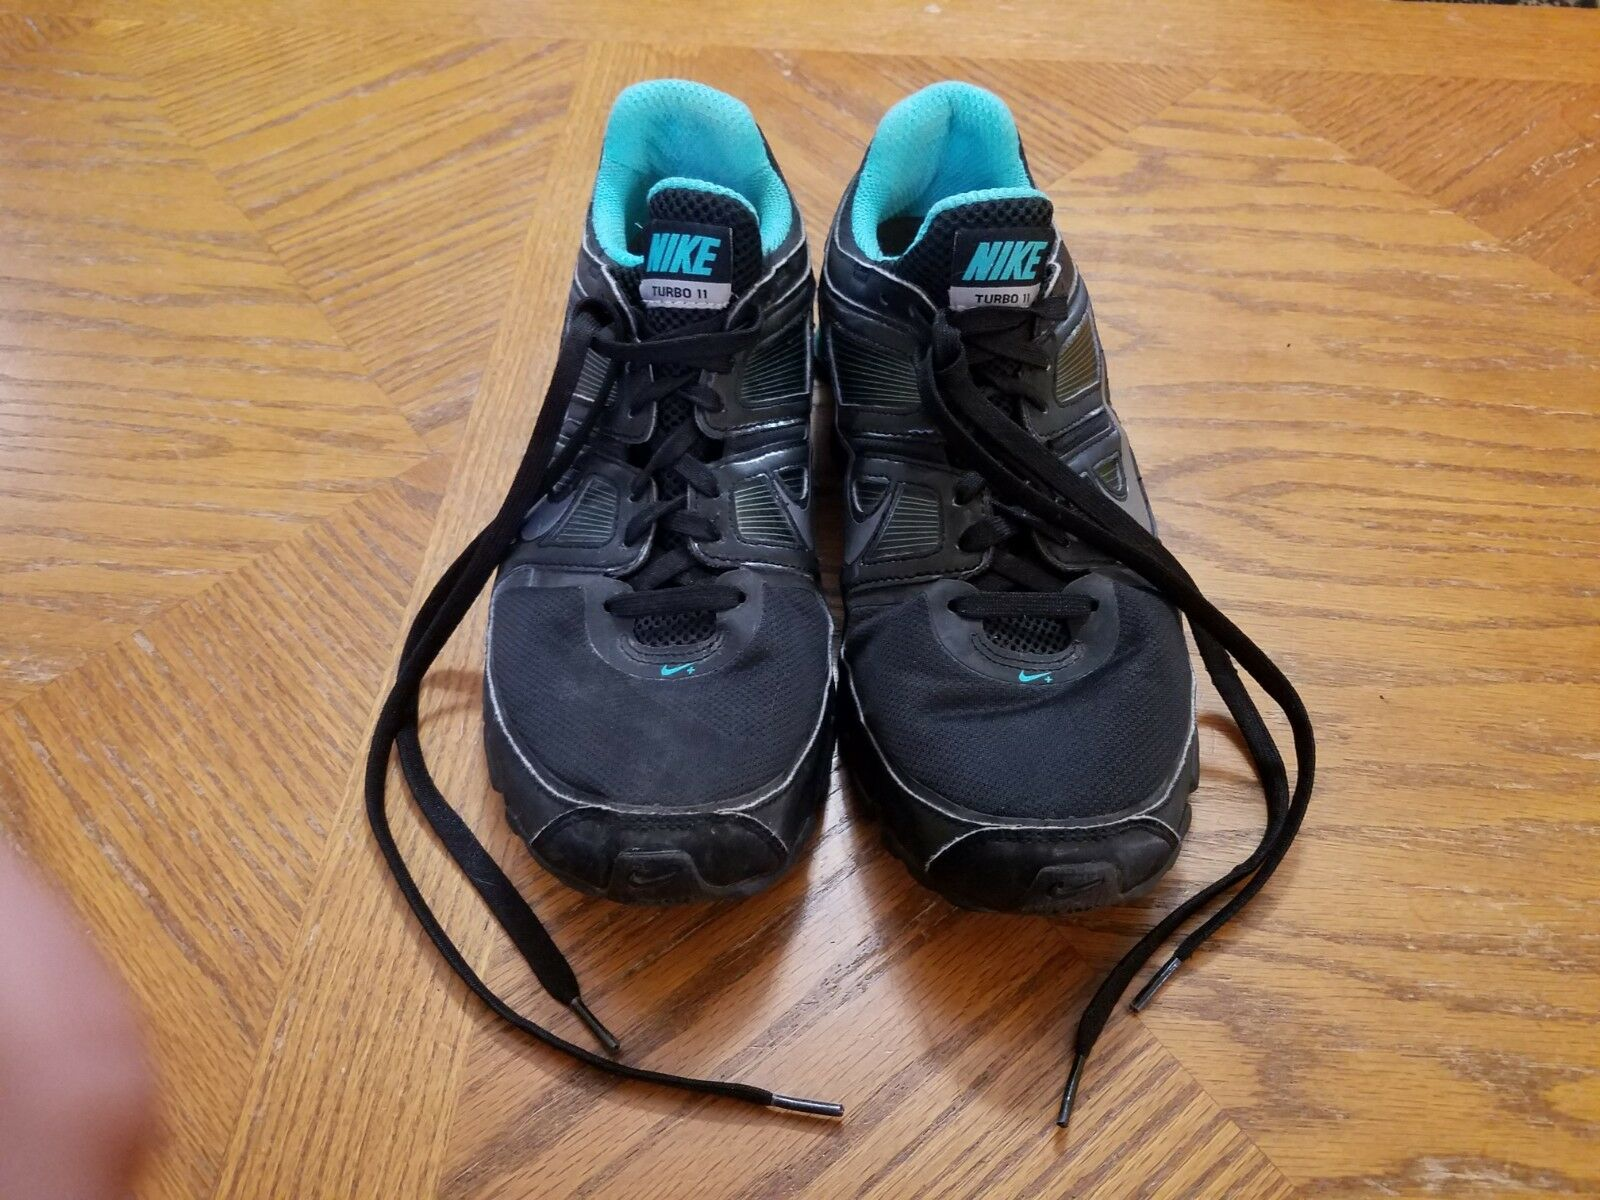 Womens Size 10.5 Nike Turbo Shox 11 11 11 407268-011 Black   Aqua bluee - Euc ebd55e